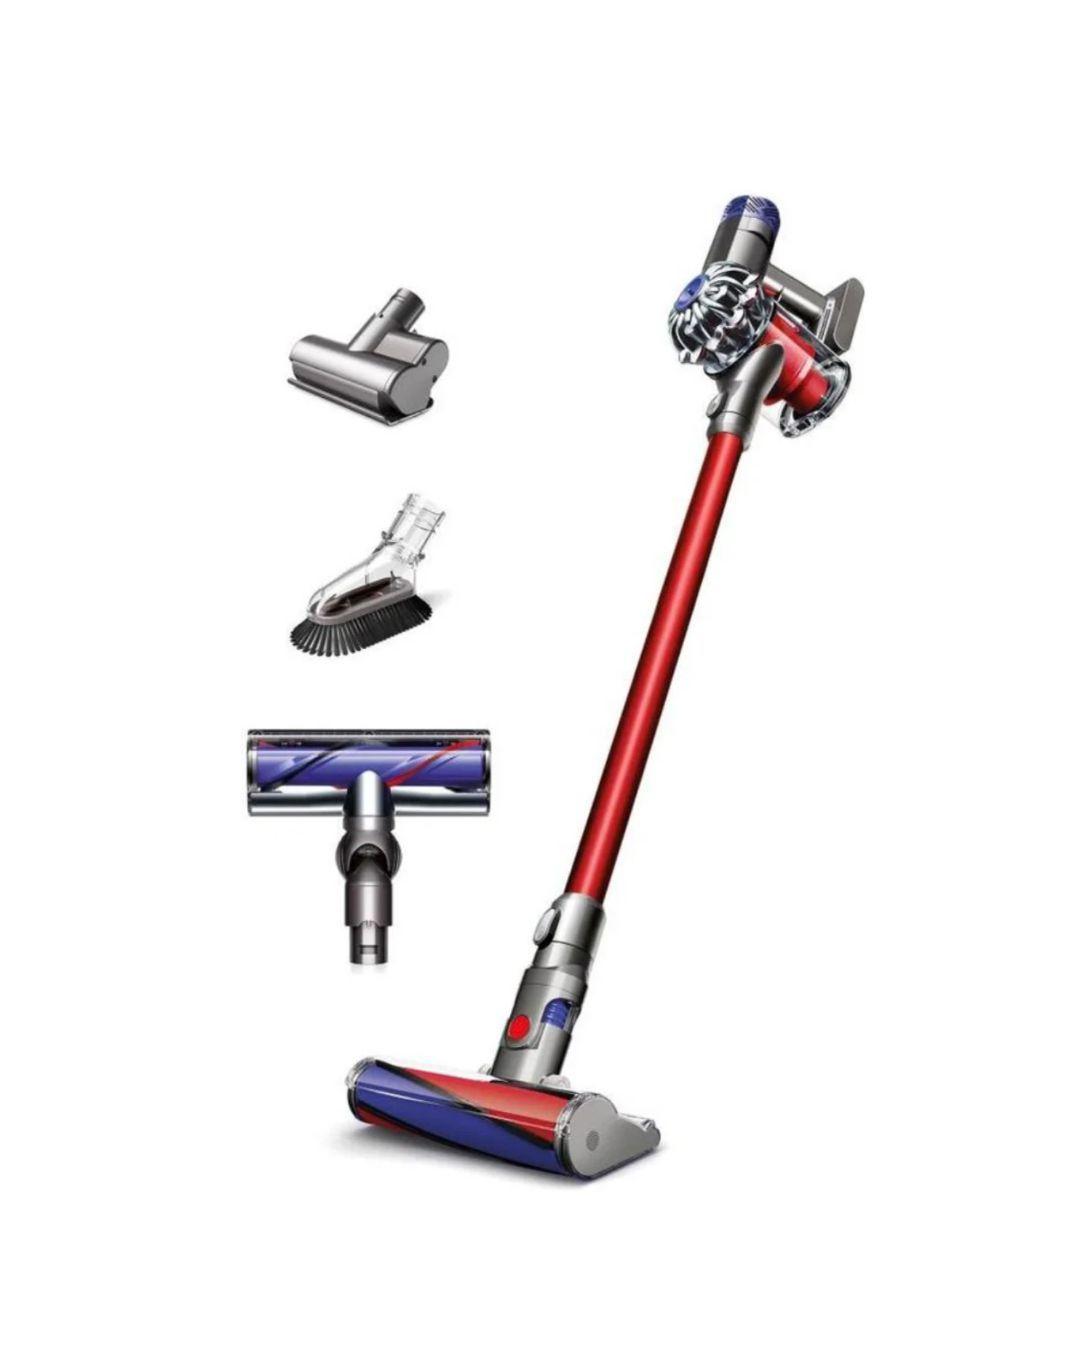 Dyson v6 absolute cordless stick vacuum model 20956001